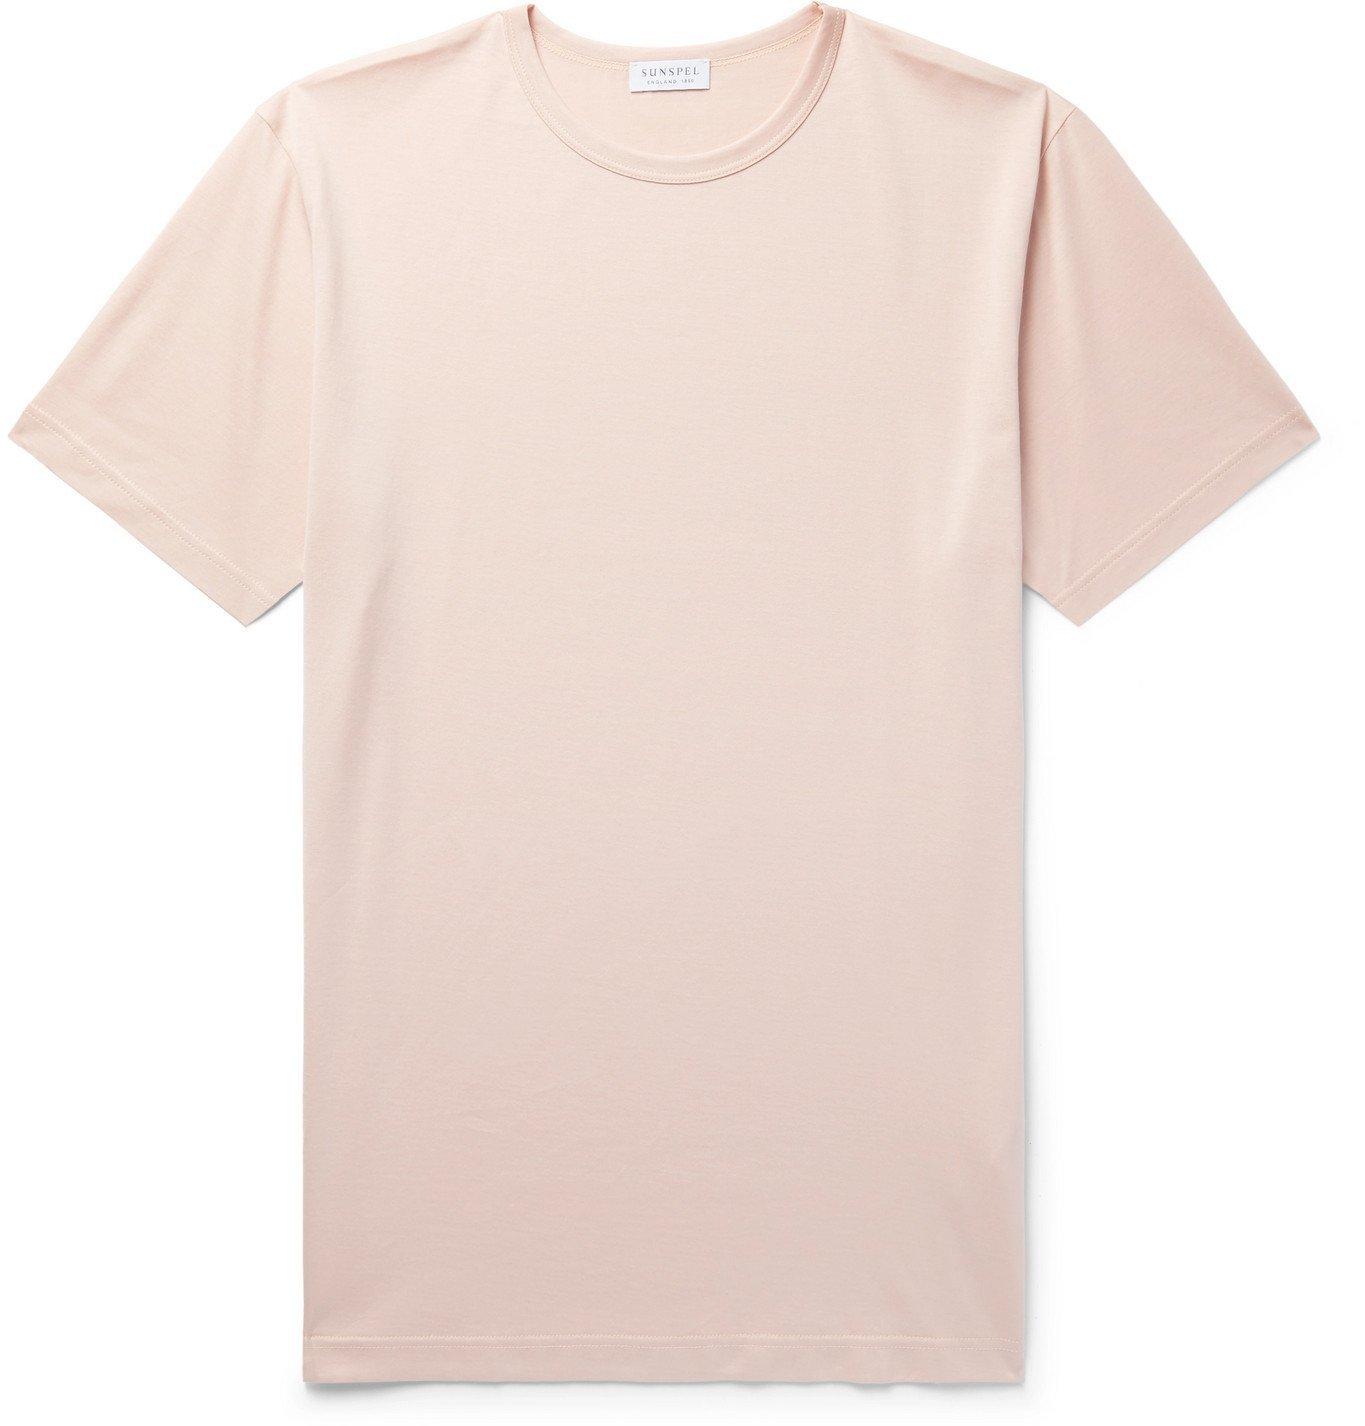 Sunspel - Slim-Fit Cotton-Jersey T-Shirt - Pink